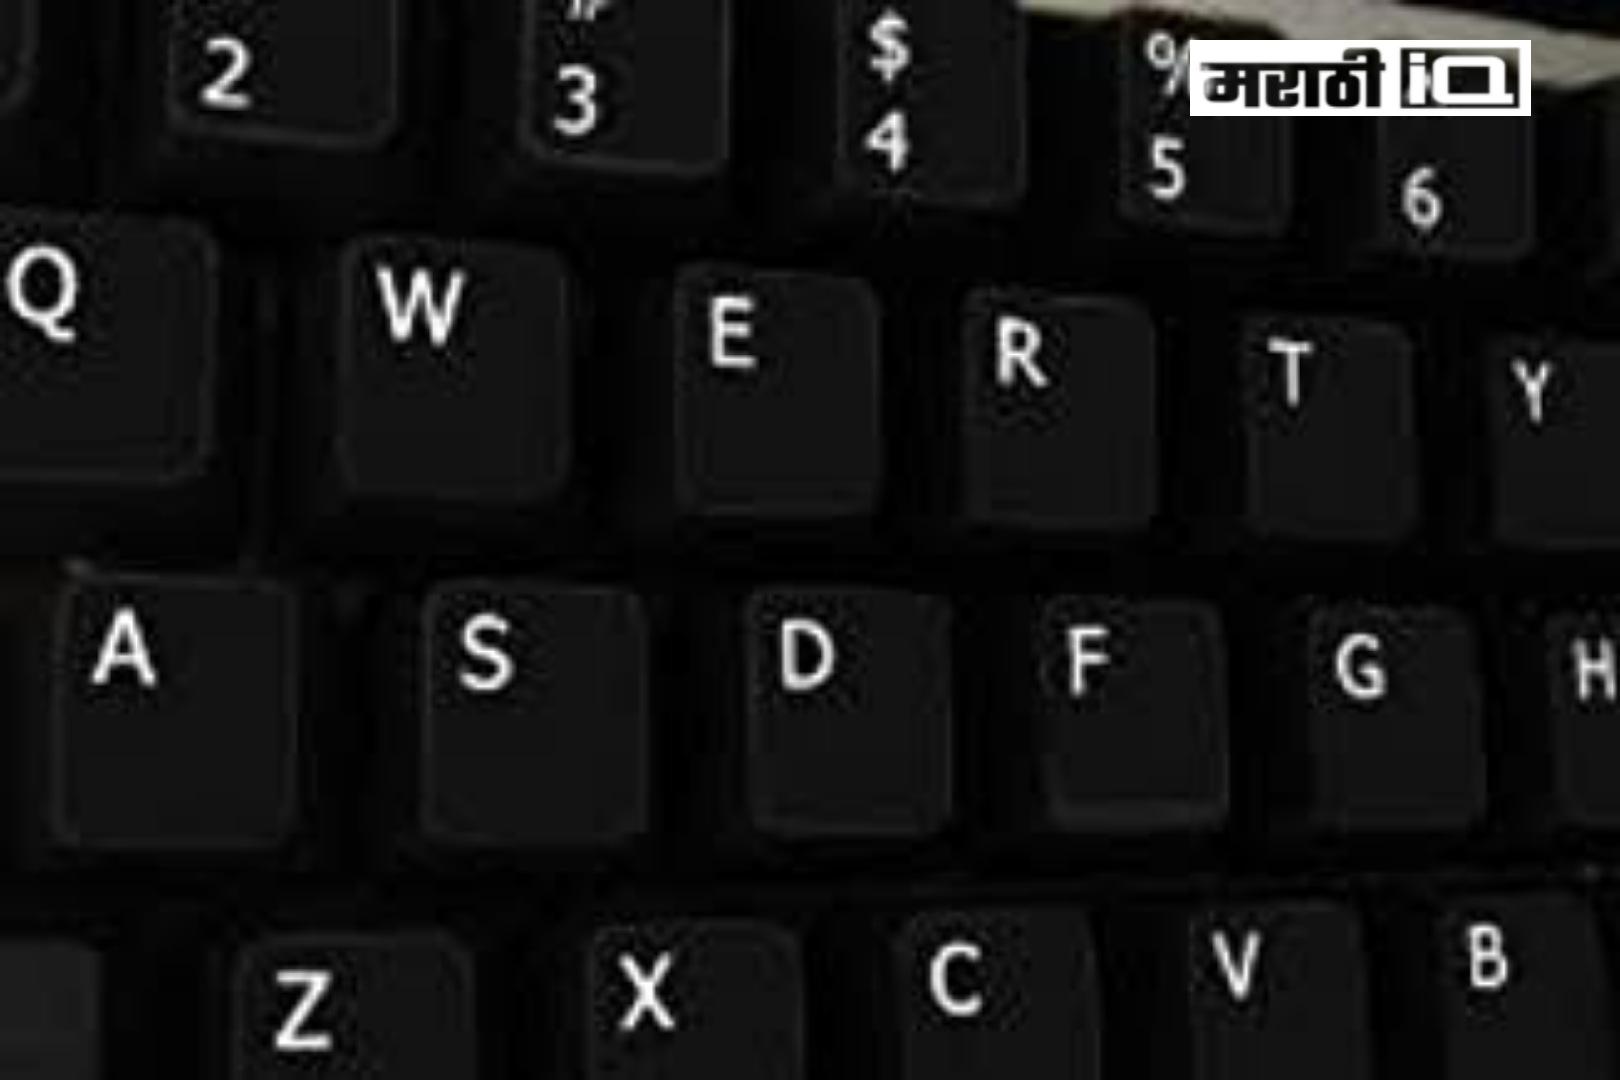 Whya keyboard is qwerty in marathi